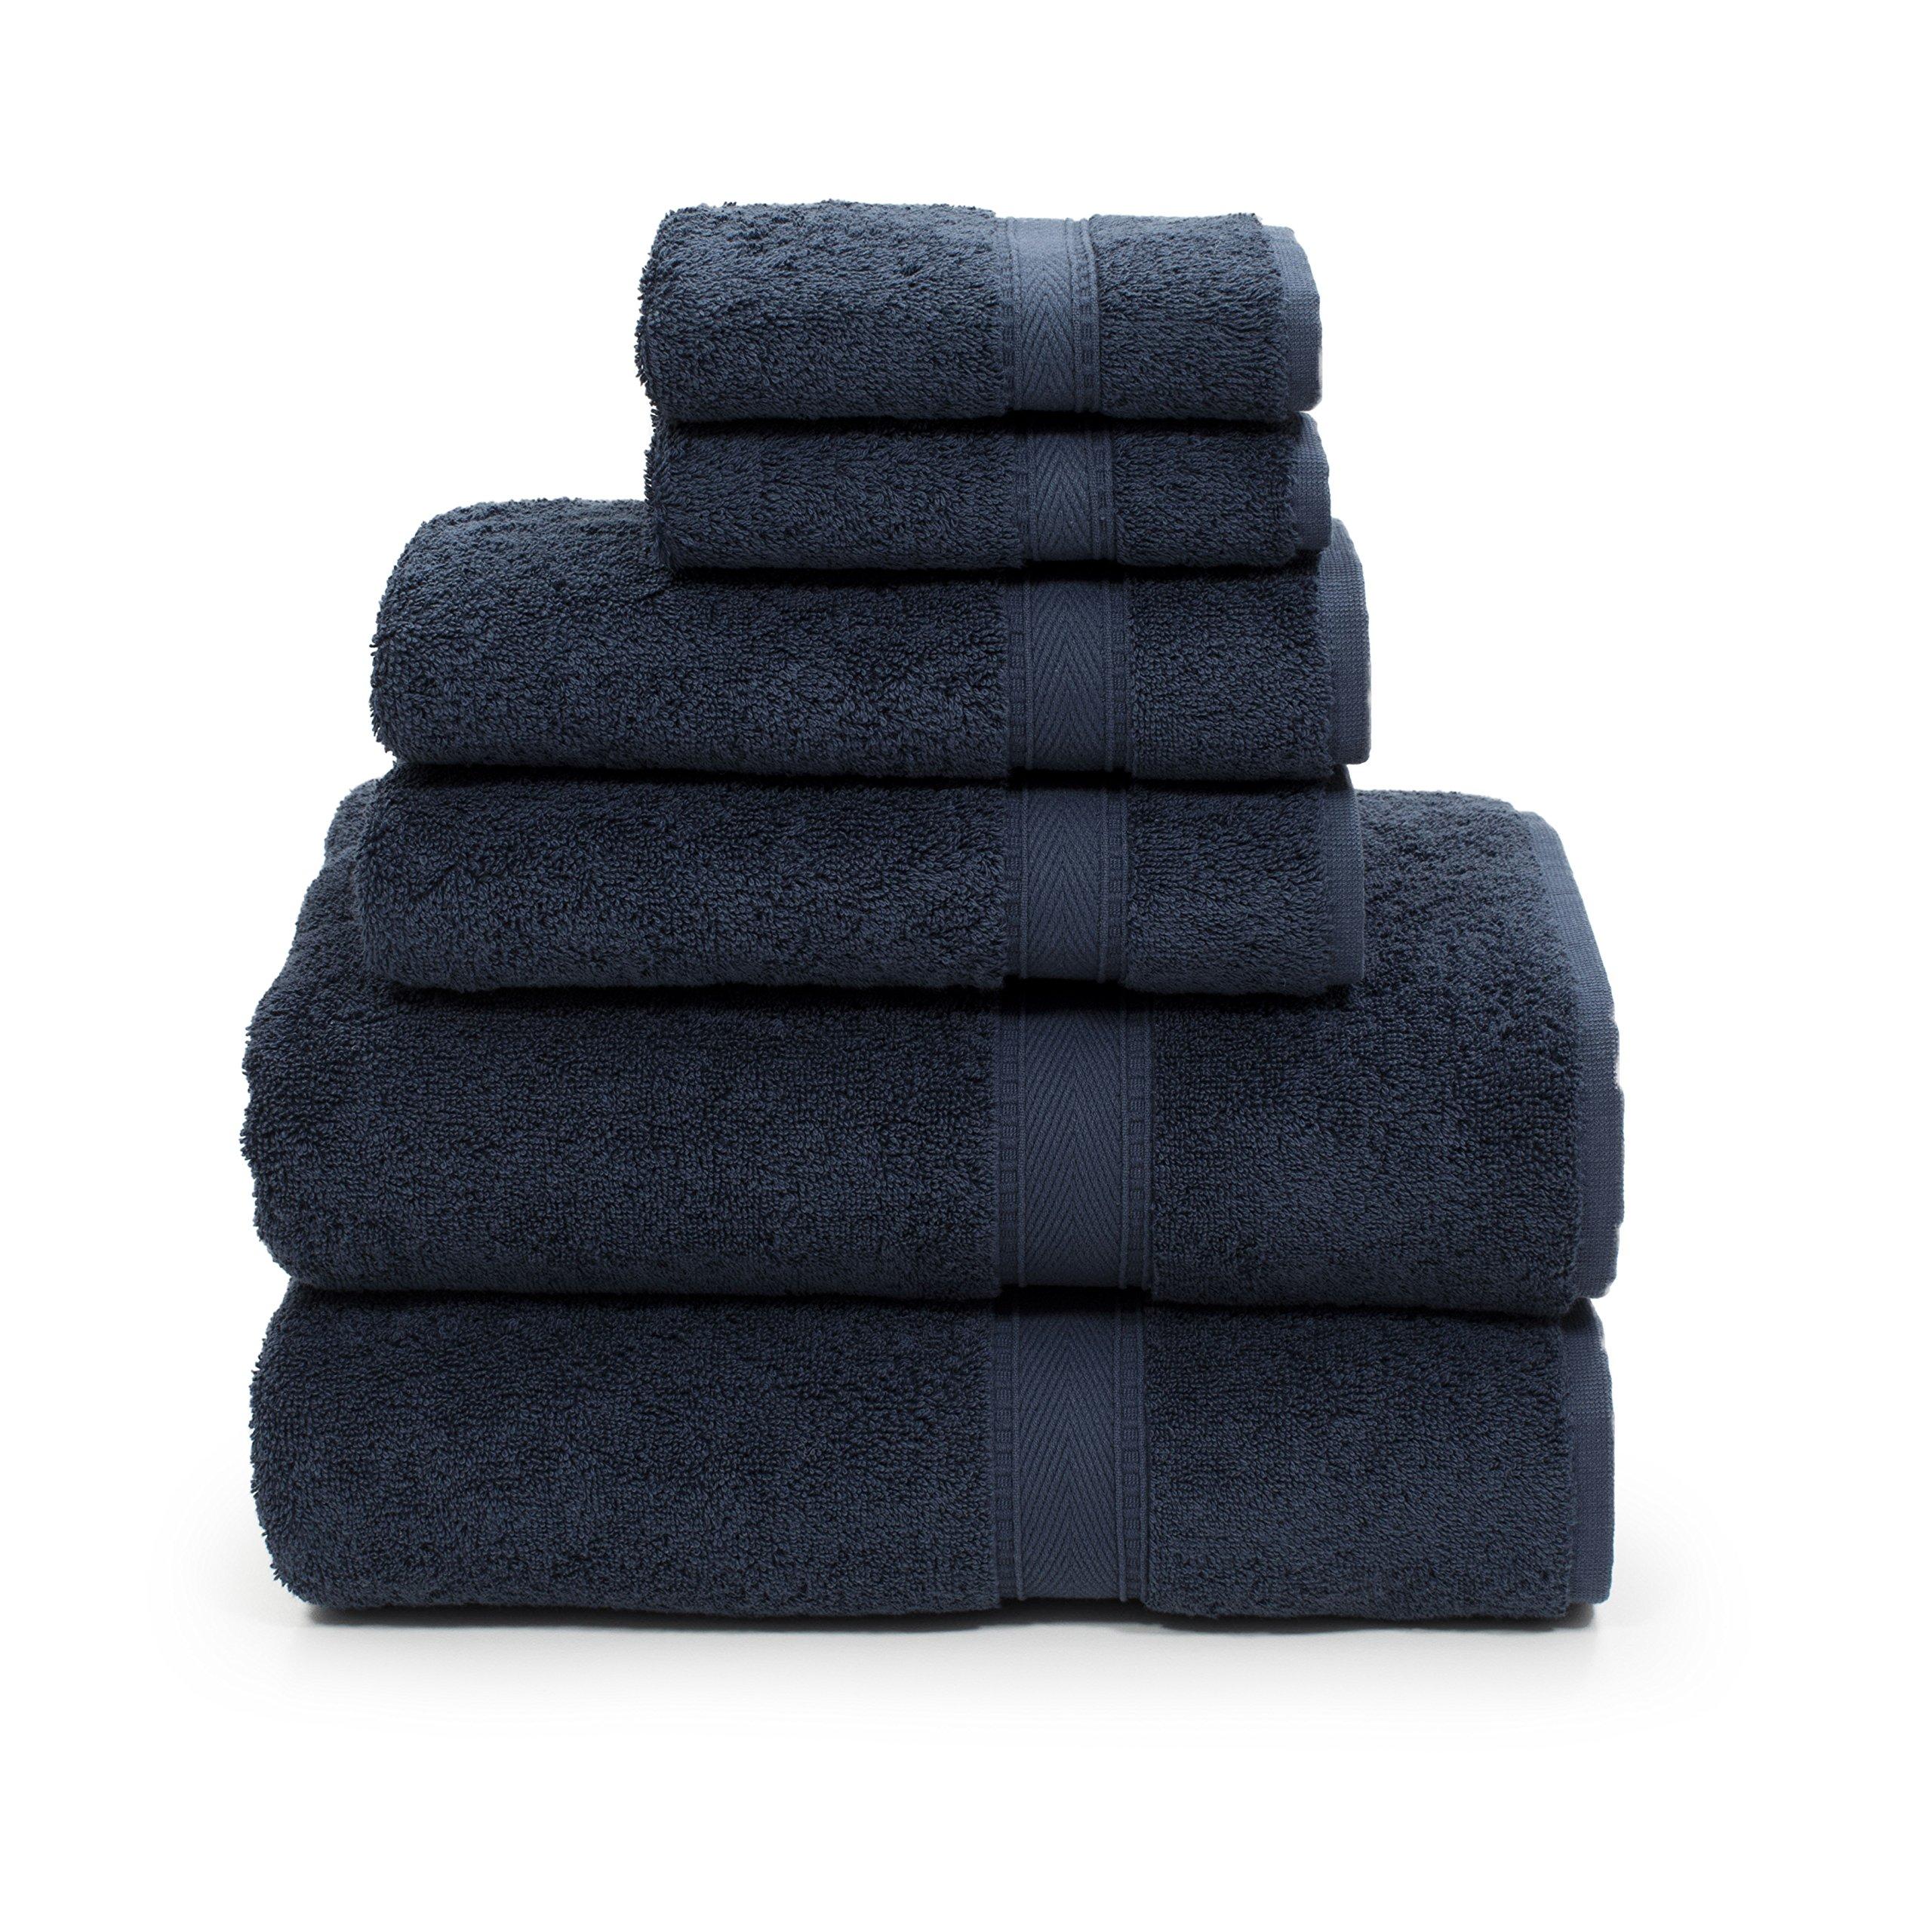 Linum Home Textiles SN50-6C Bath Towel, Navy